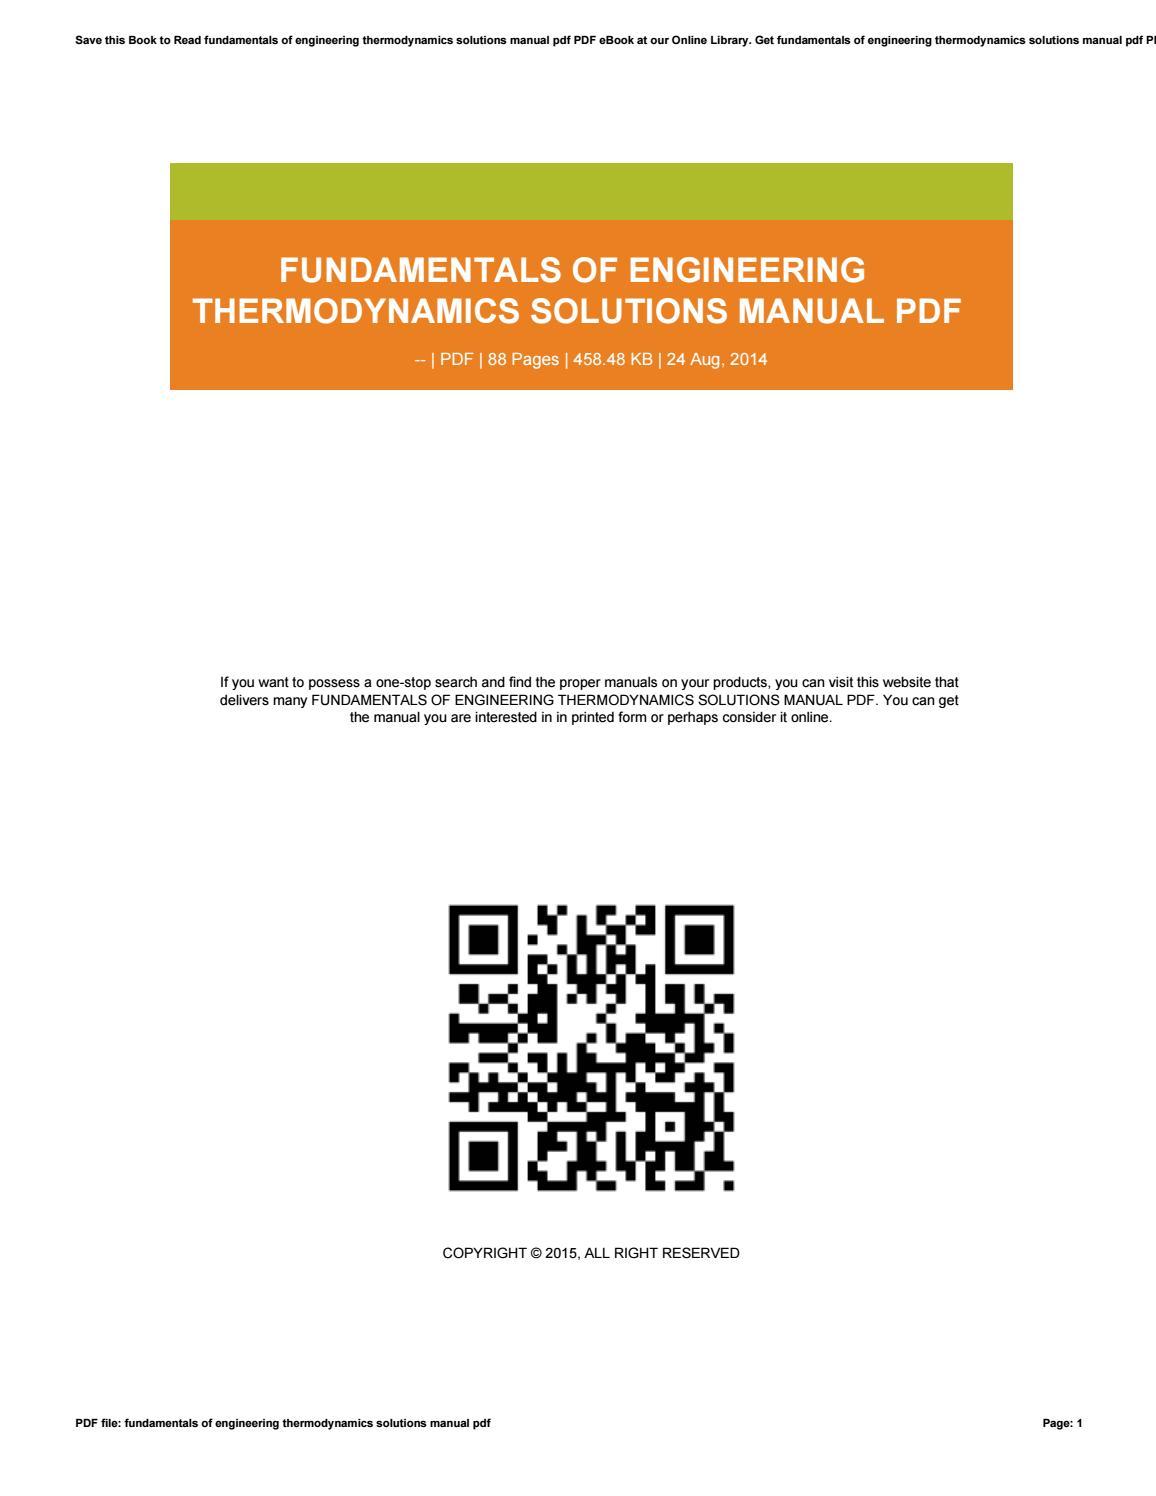 Fundamentals of engineering thermodynamics solutions manual pdf by u254 -  issuu